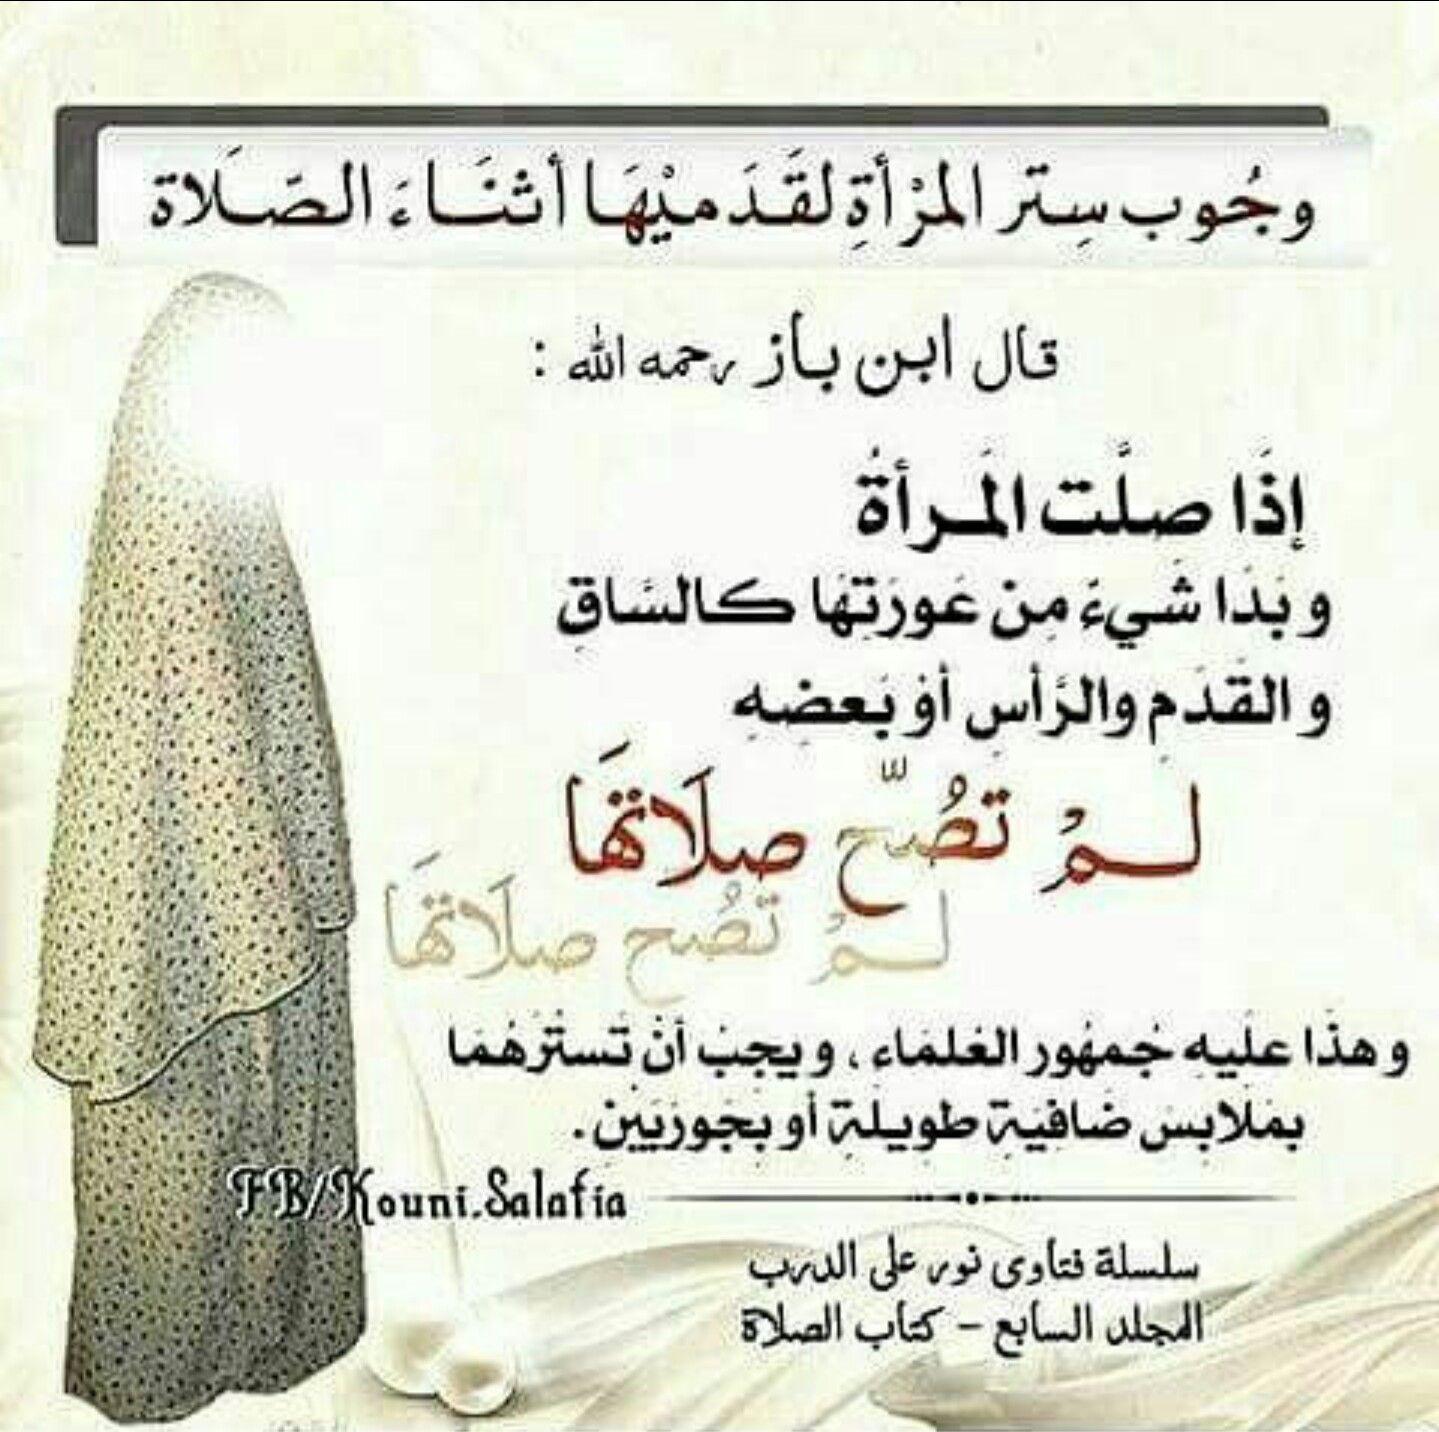 Pin By Hammoudi On الاسلام Holy Quran Islam Hadith